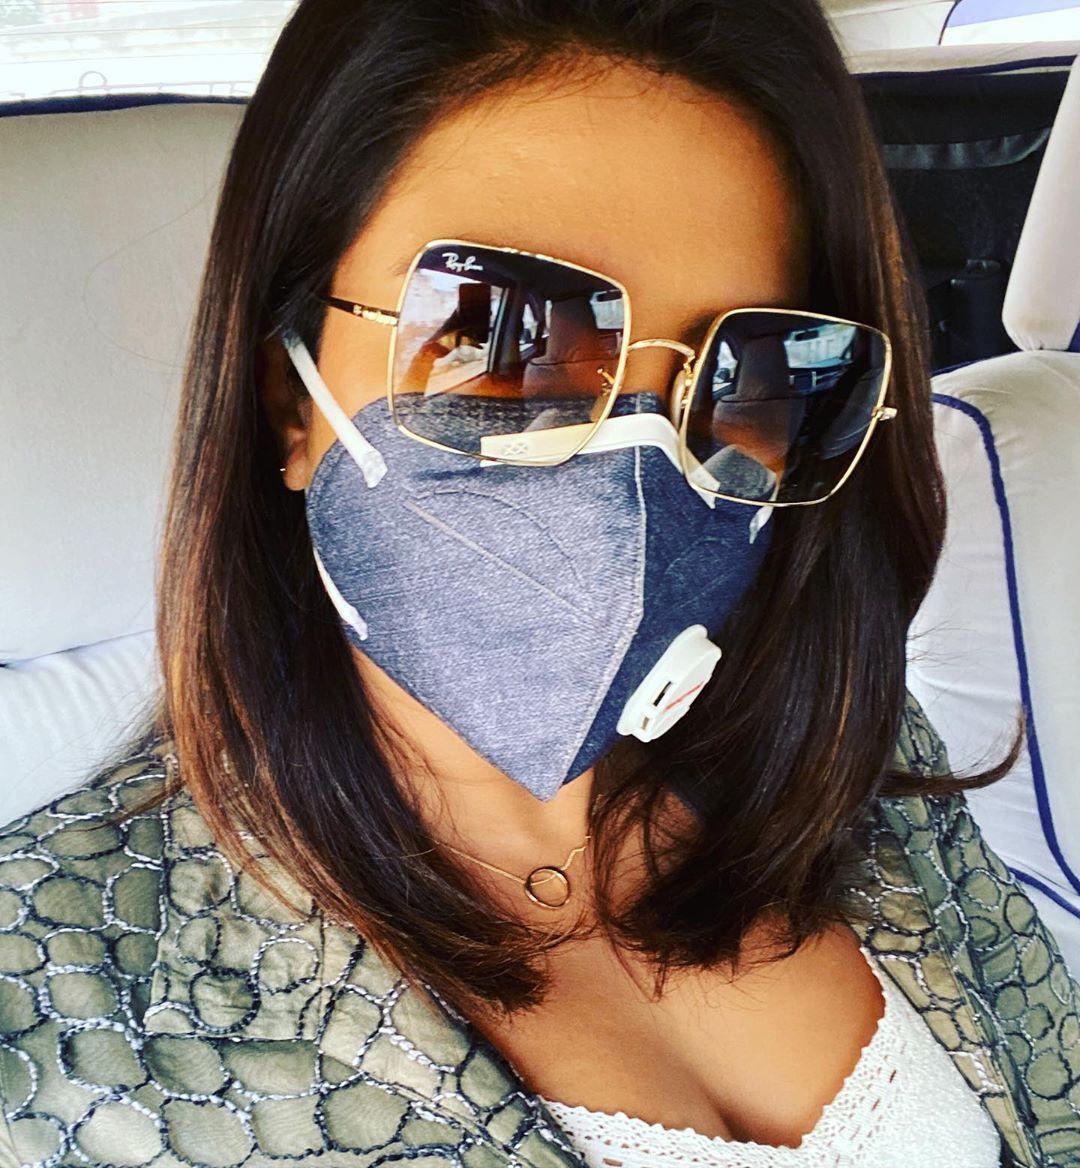 Priyanka Chopra Jonas On Instagram Shoot Days For Thewhitetiger It S So Hard To Shoot Here Right Now That I Priyanka Chopra Square Sunglasses Women Chopra